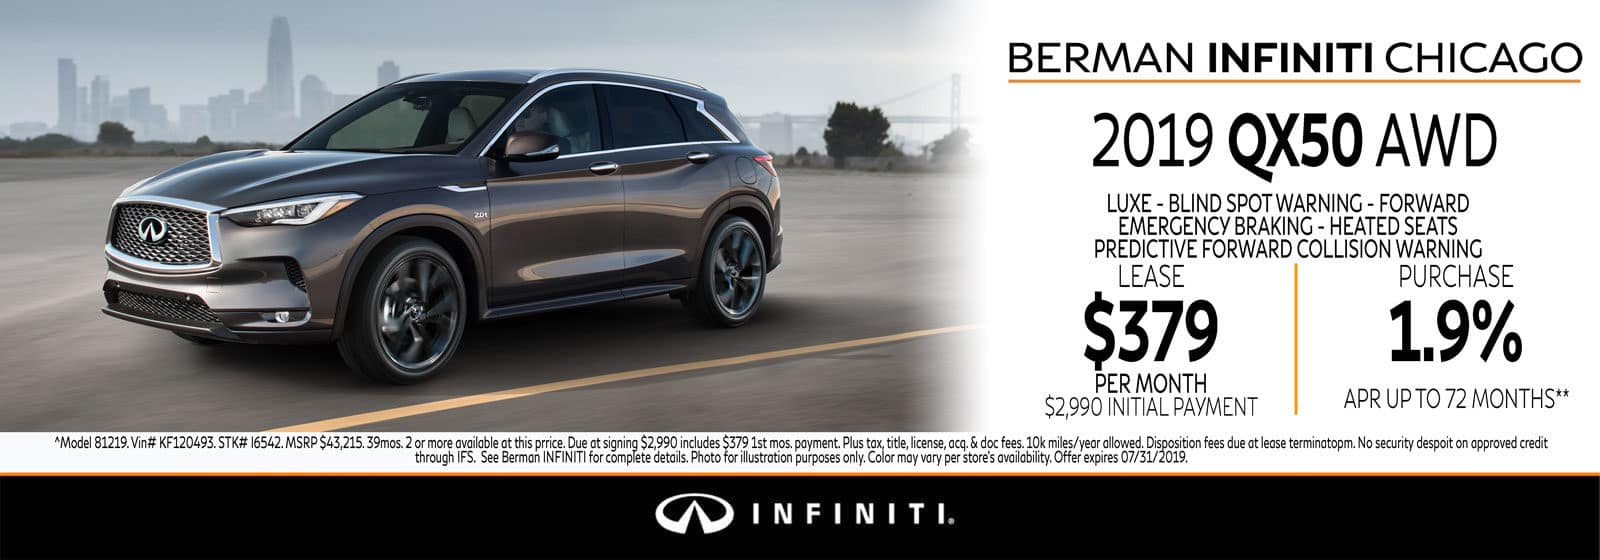 New 2019 INFINITI QX50 July offer at Berman INFINITI Chicago!